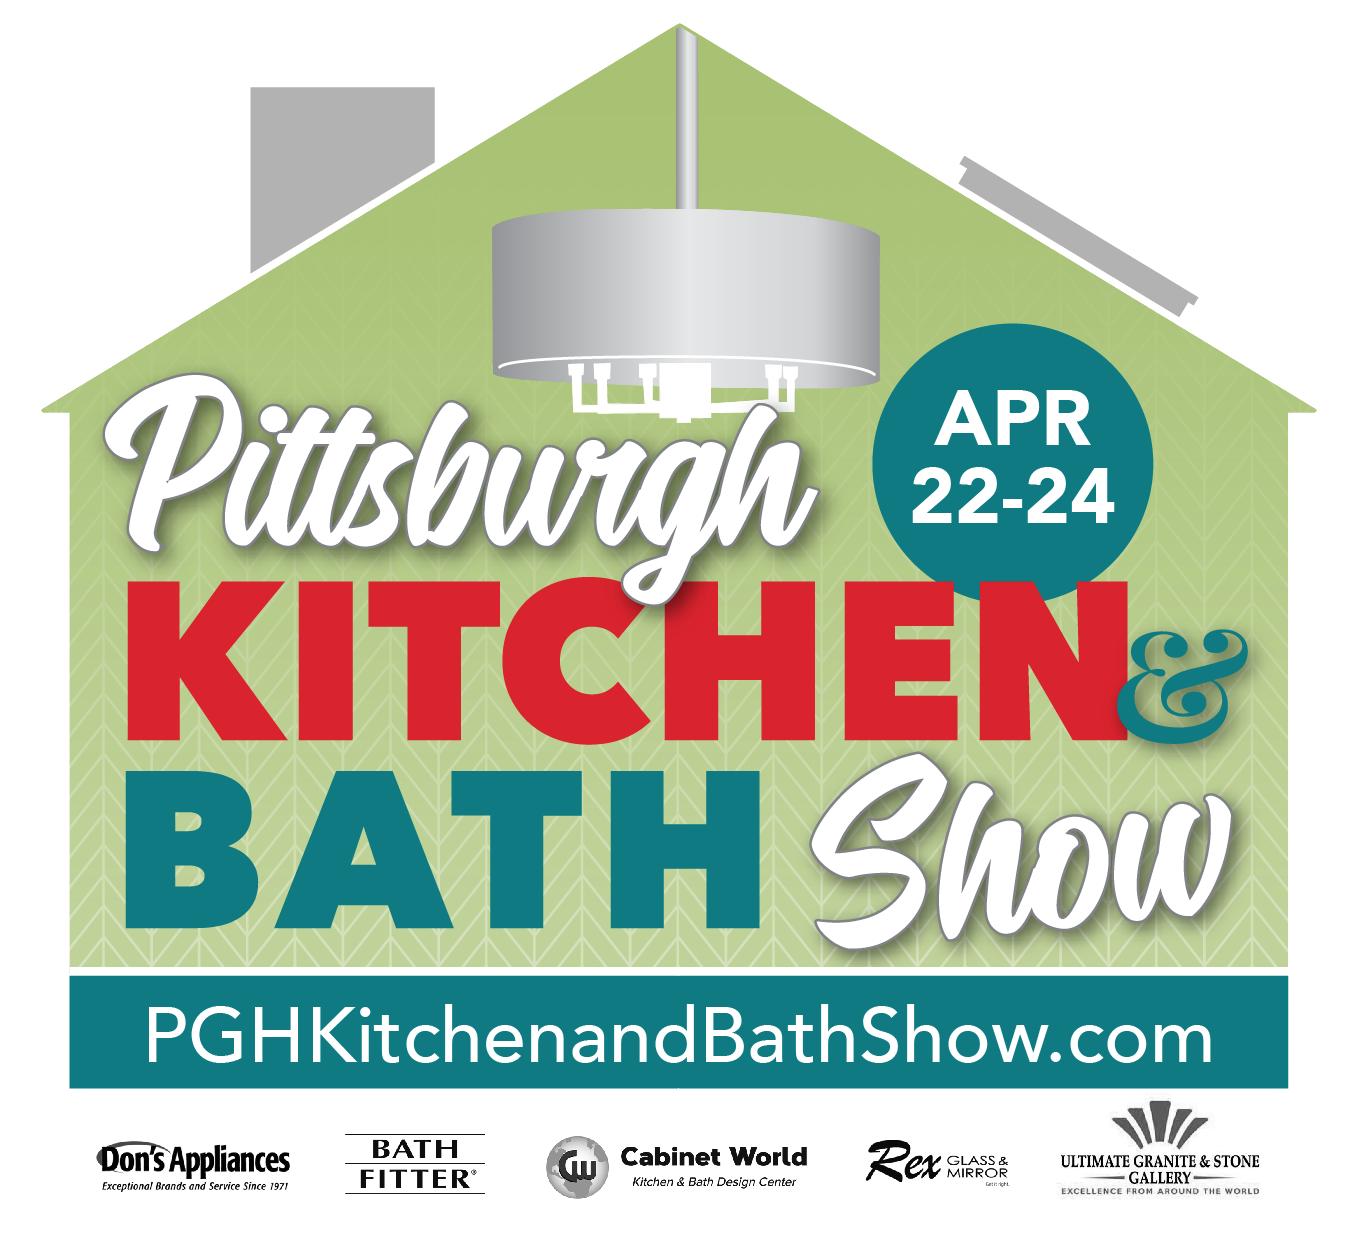 The Pittsburgh Kitchen & Bath Show